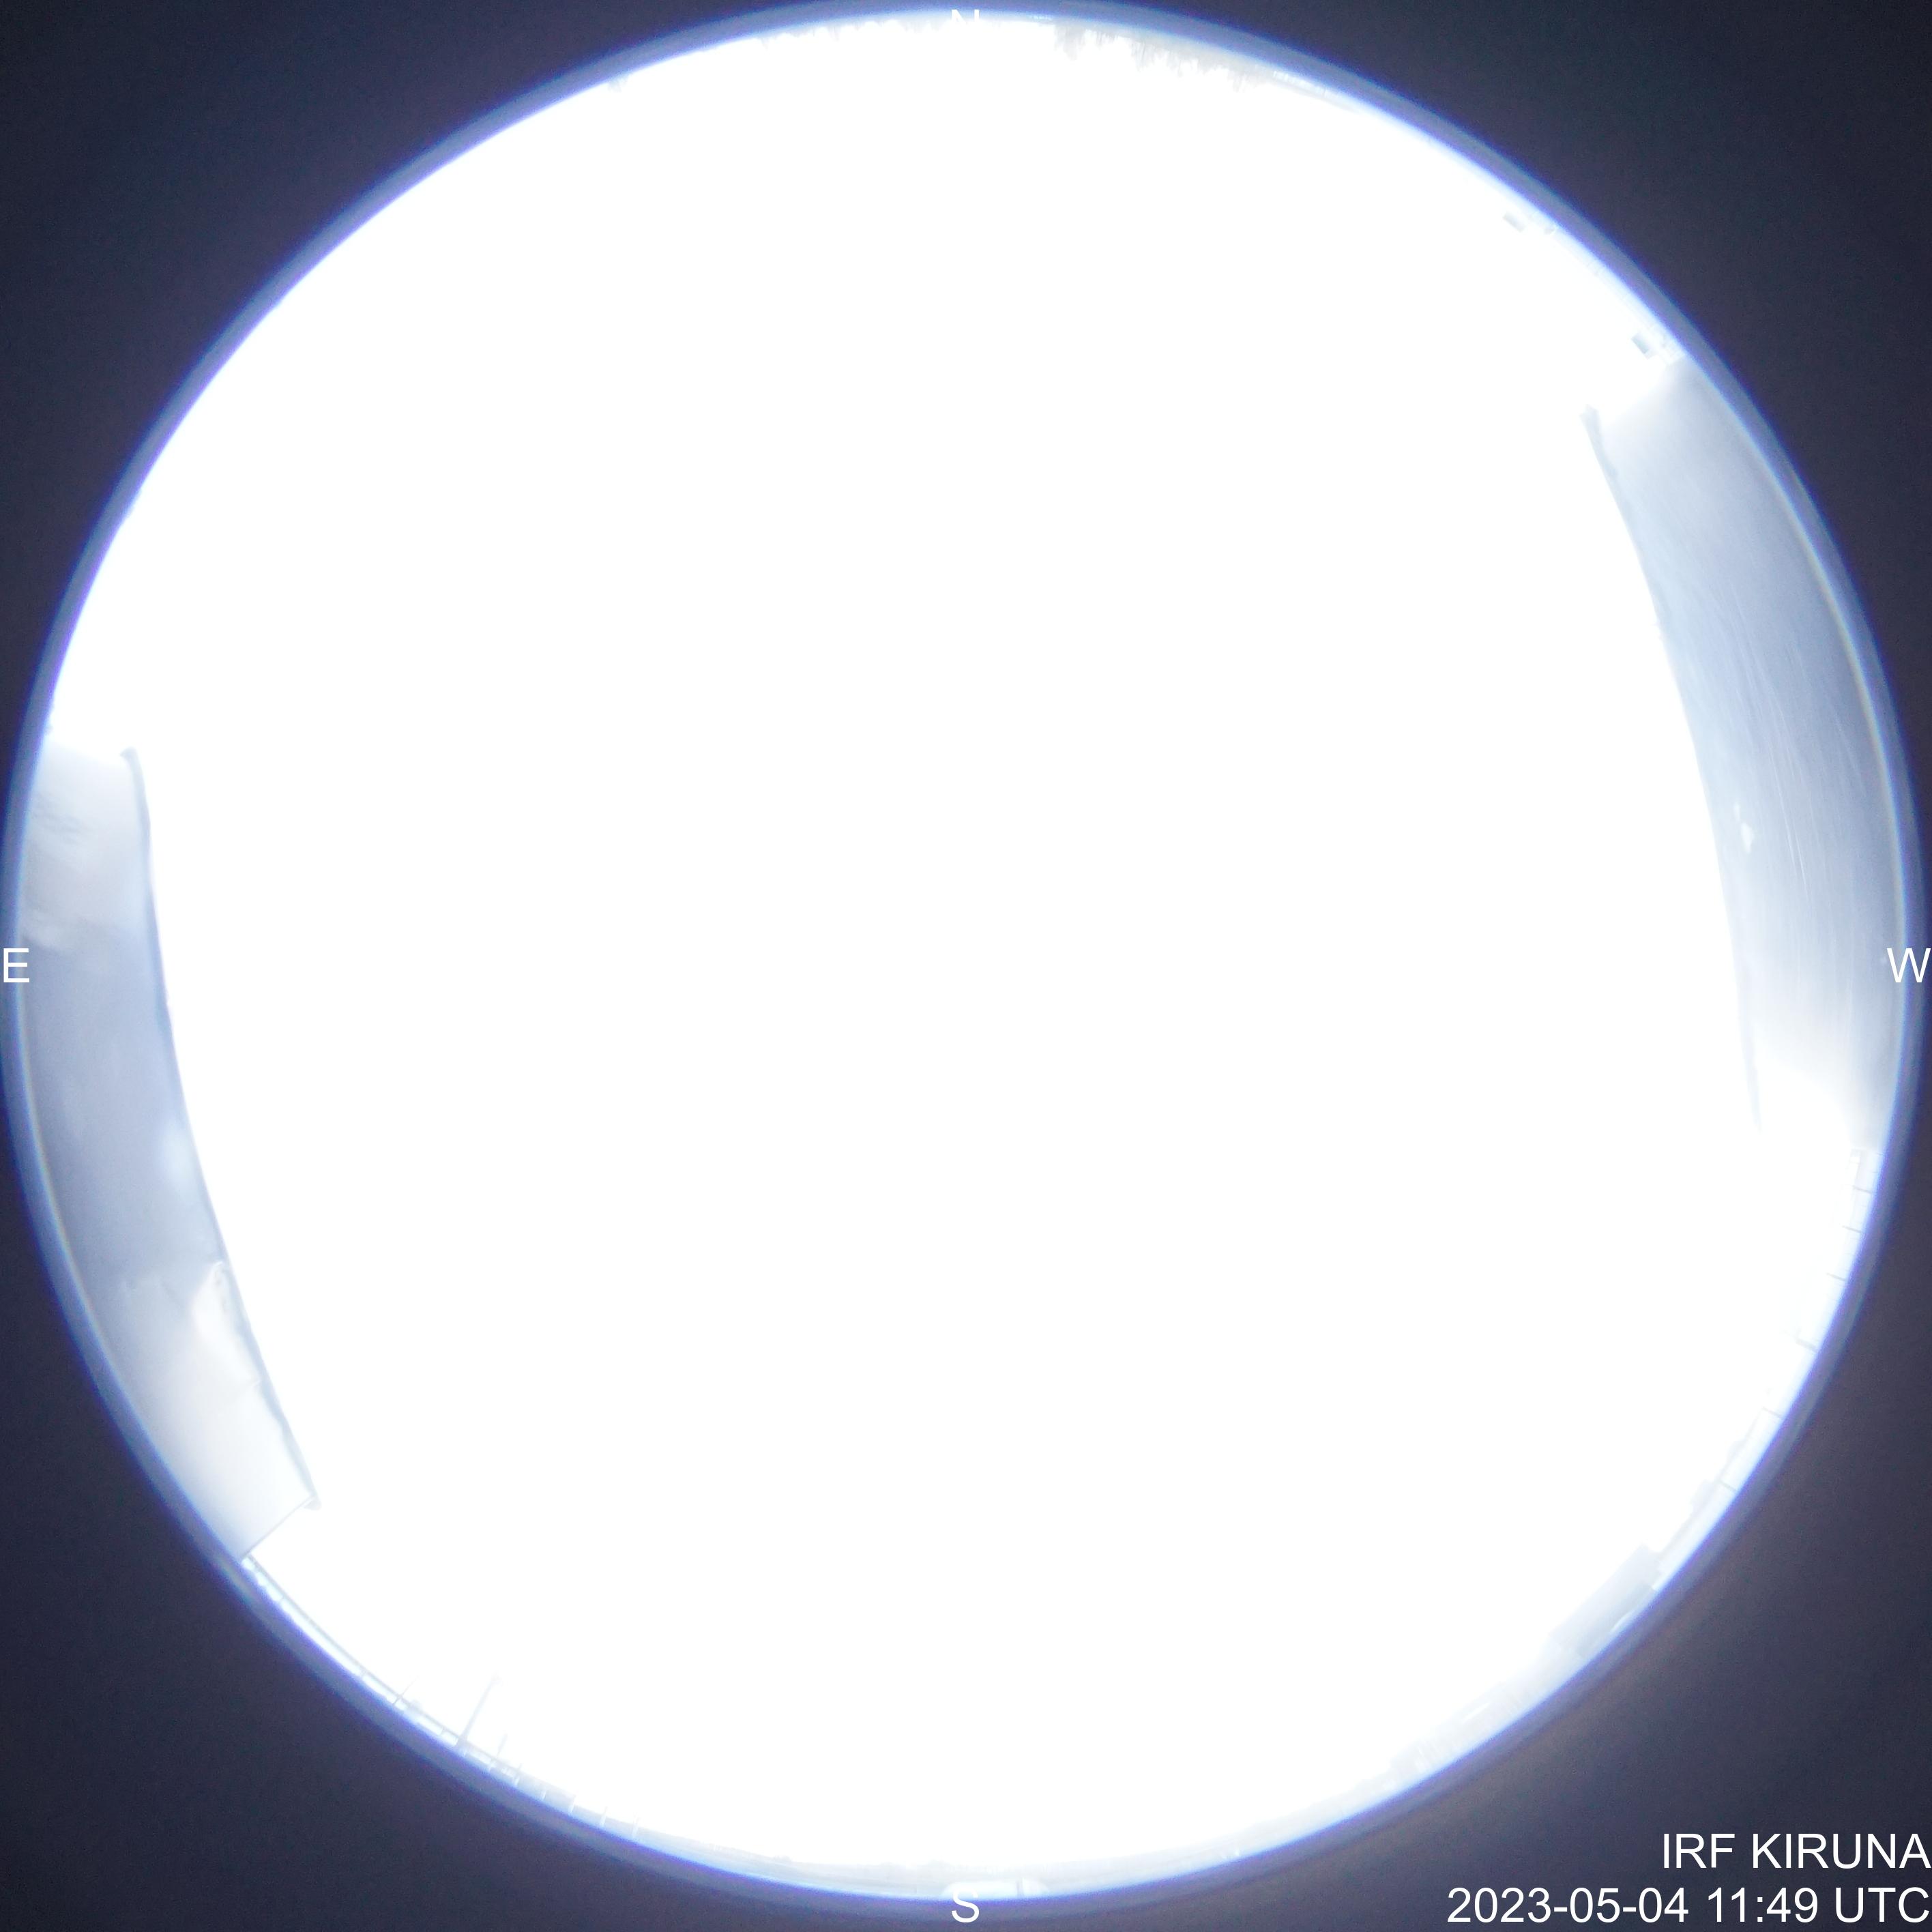 Web Camera is located in Kiruna, Sweden.